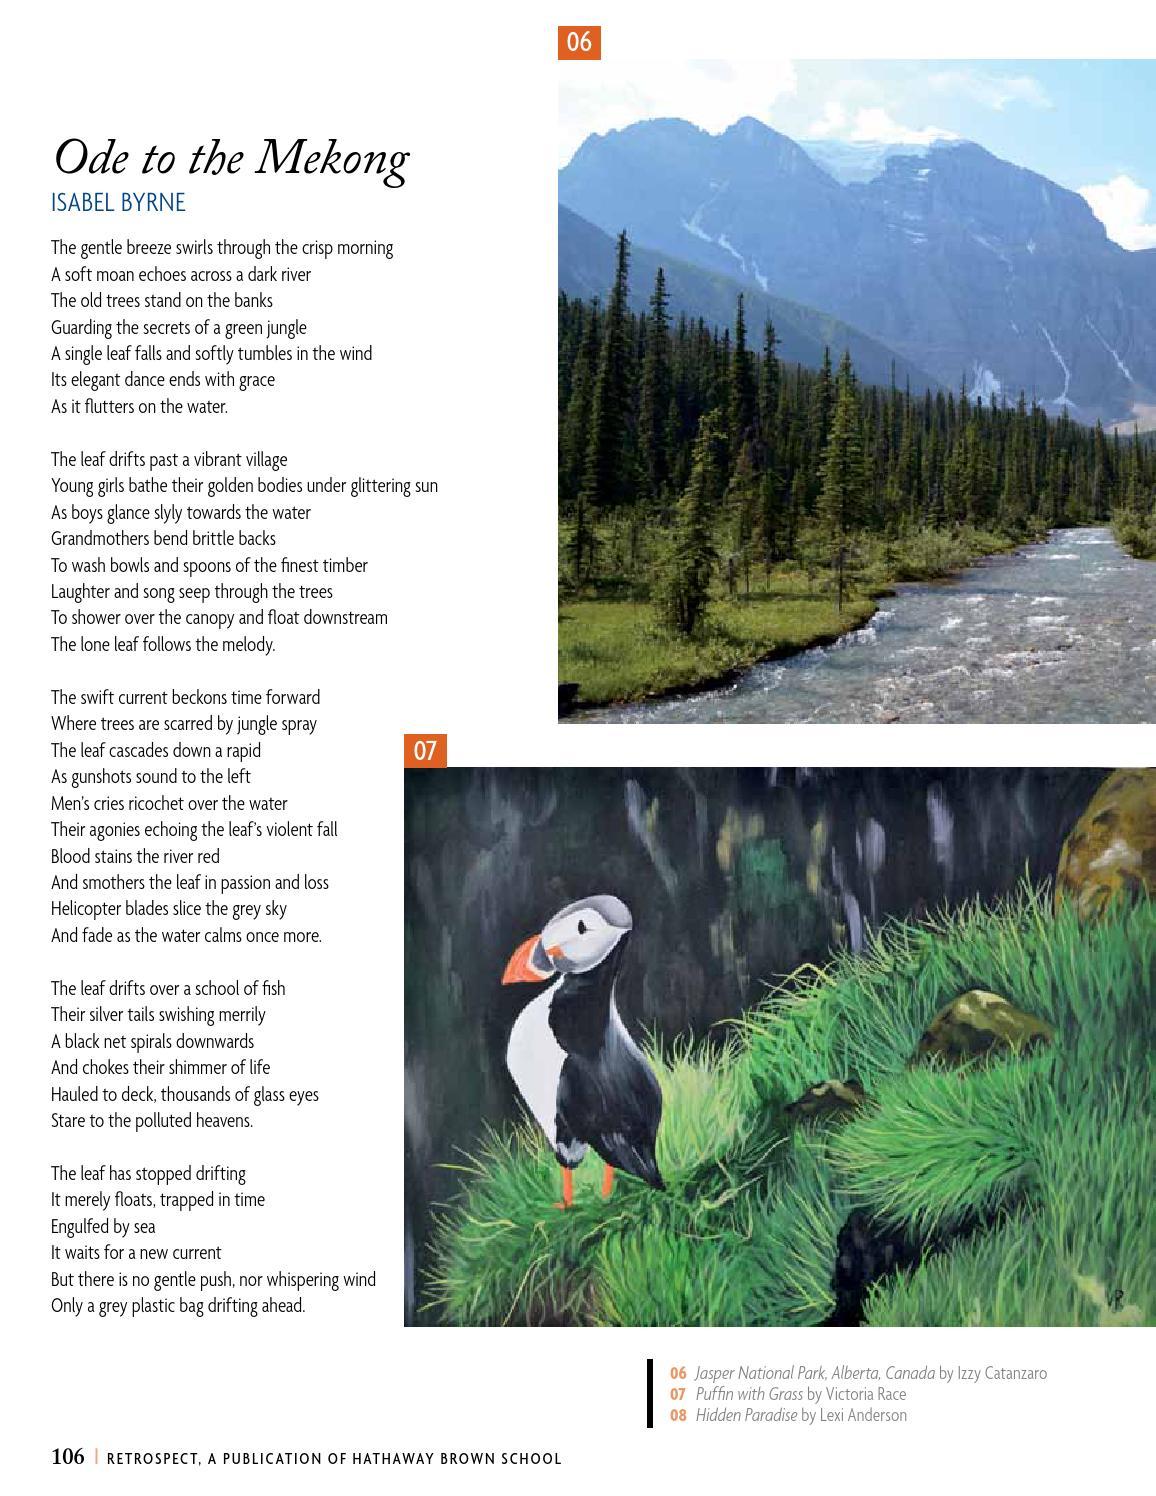 Retrospect Volume 2 May 2015 by Hathaway Brown School - issuu